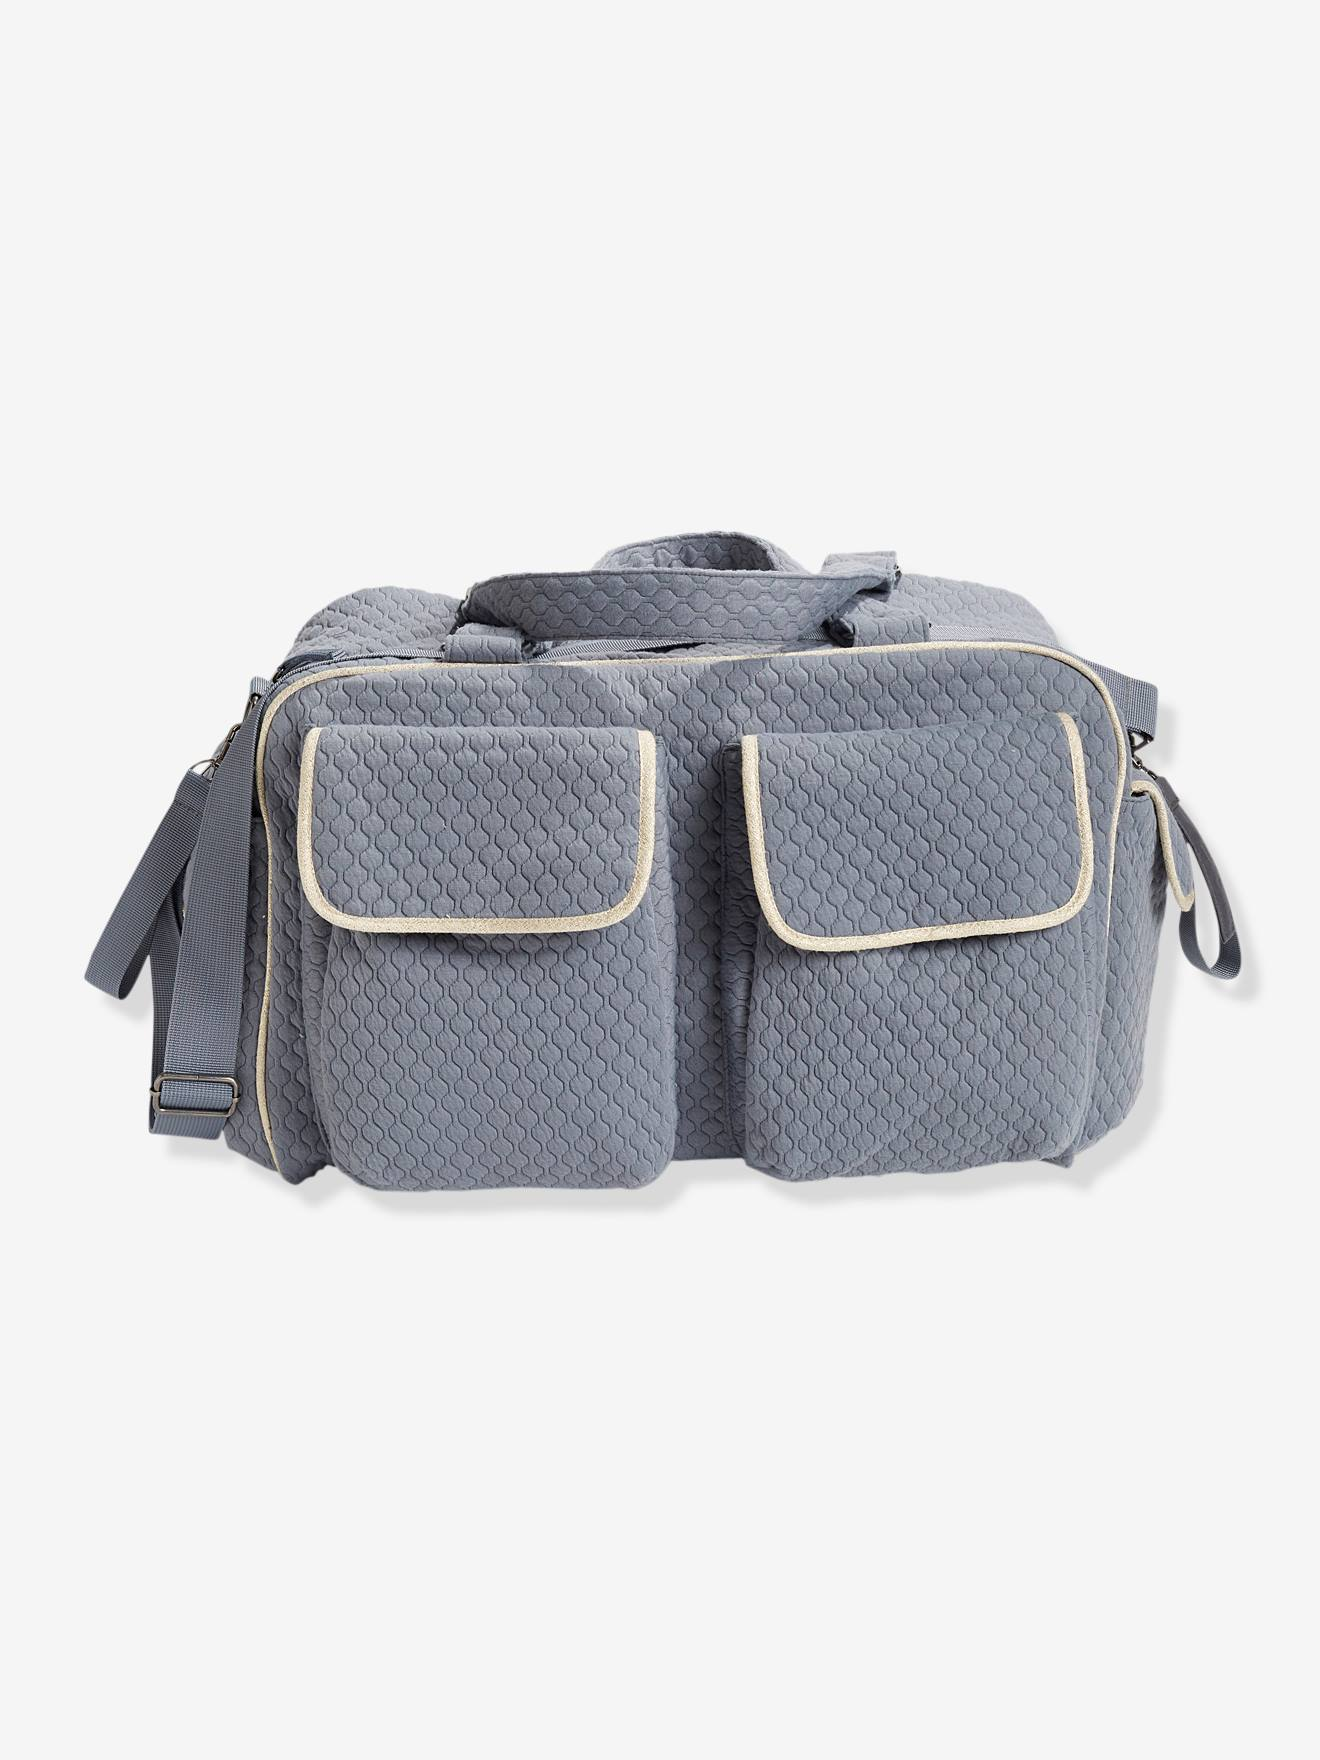 SOLDES - Sac à langer Week-end vertbaudet bleu grisé motif chevrons 96545d65551